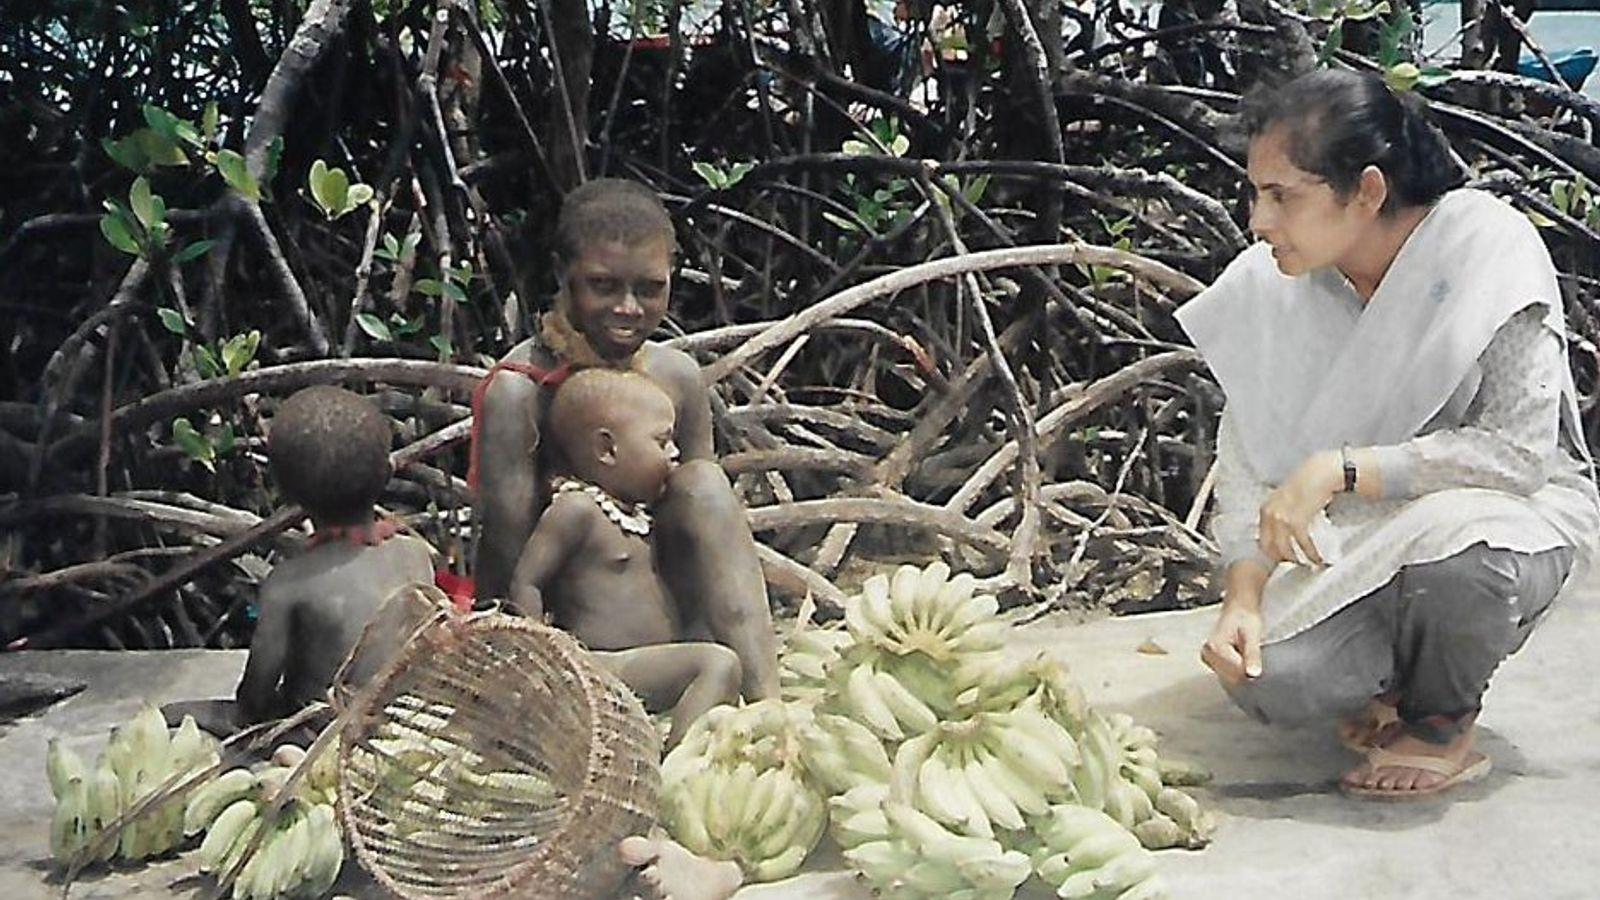 A antropóloga Madhumala Chattopadhyay passou seis anos documentando os povos das Ilhas Andaman.